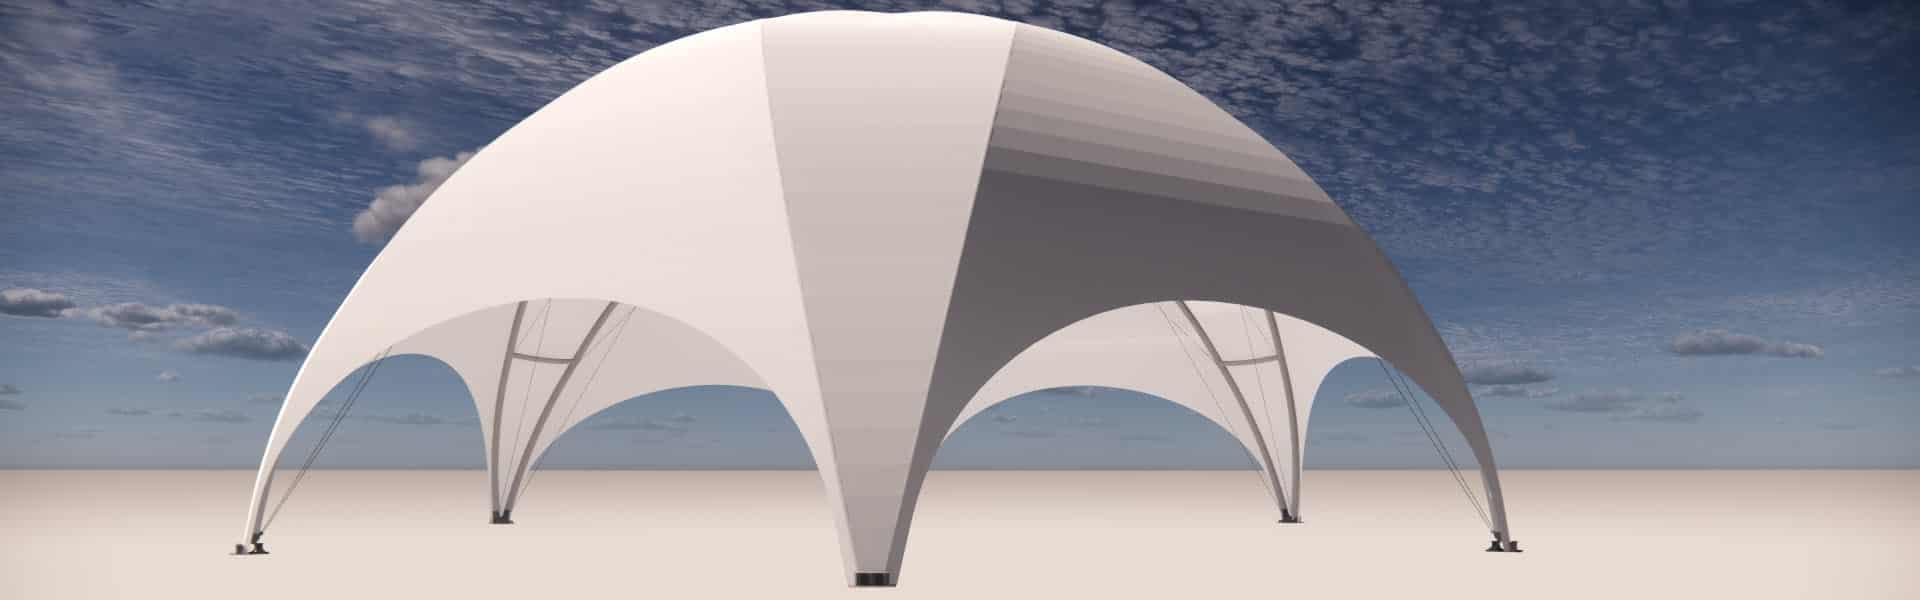 perma-dome-überdacht-175-quadratmeter